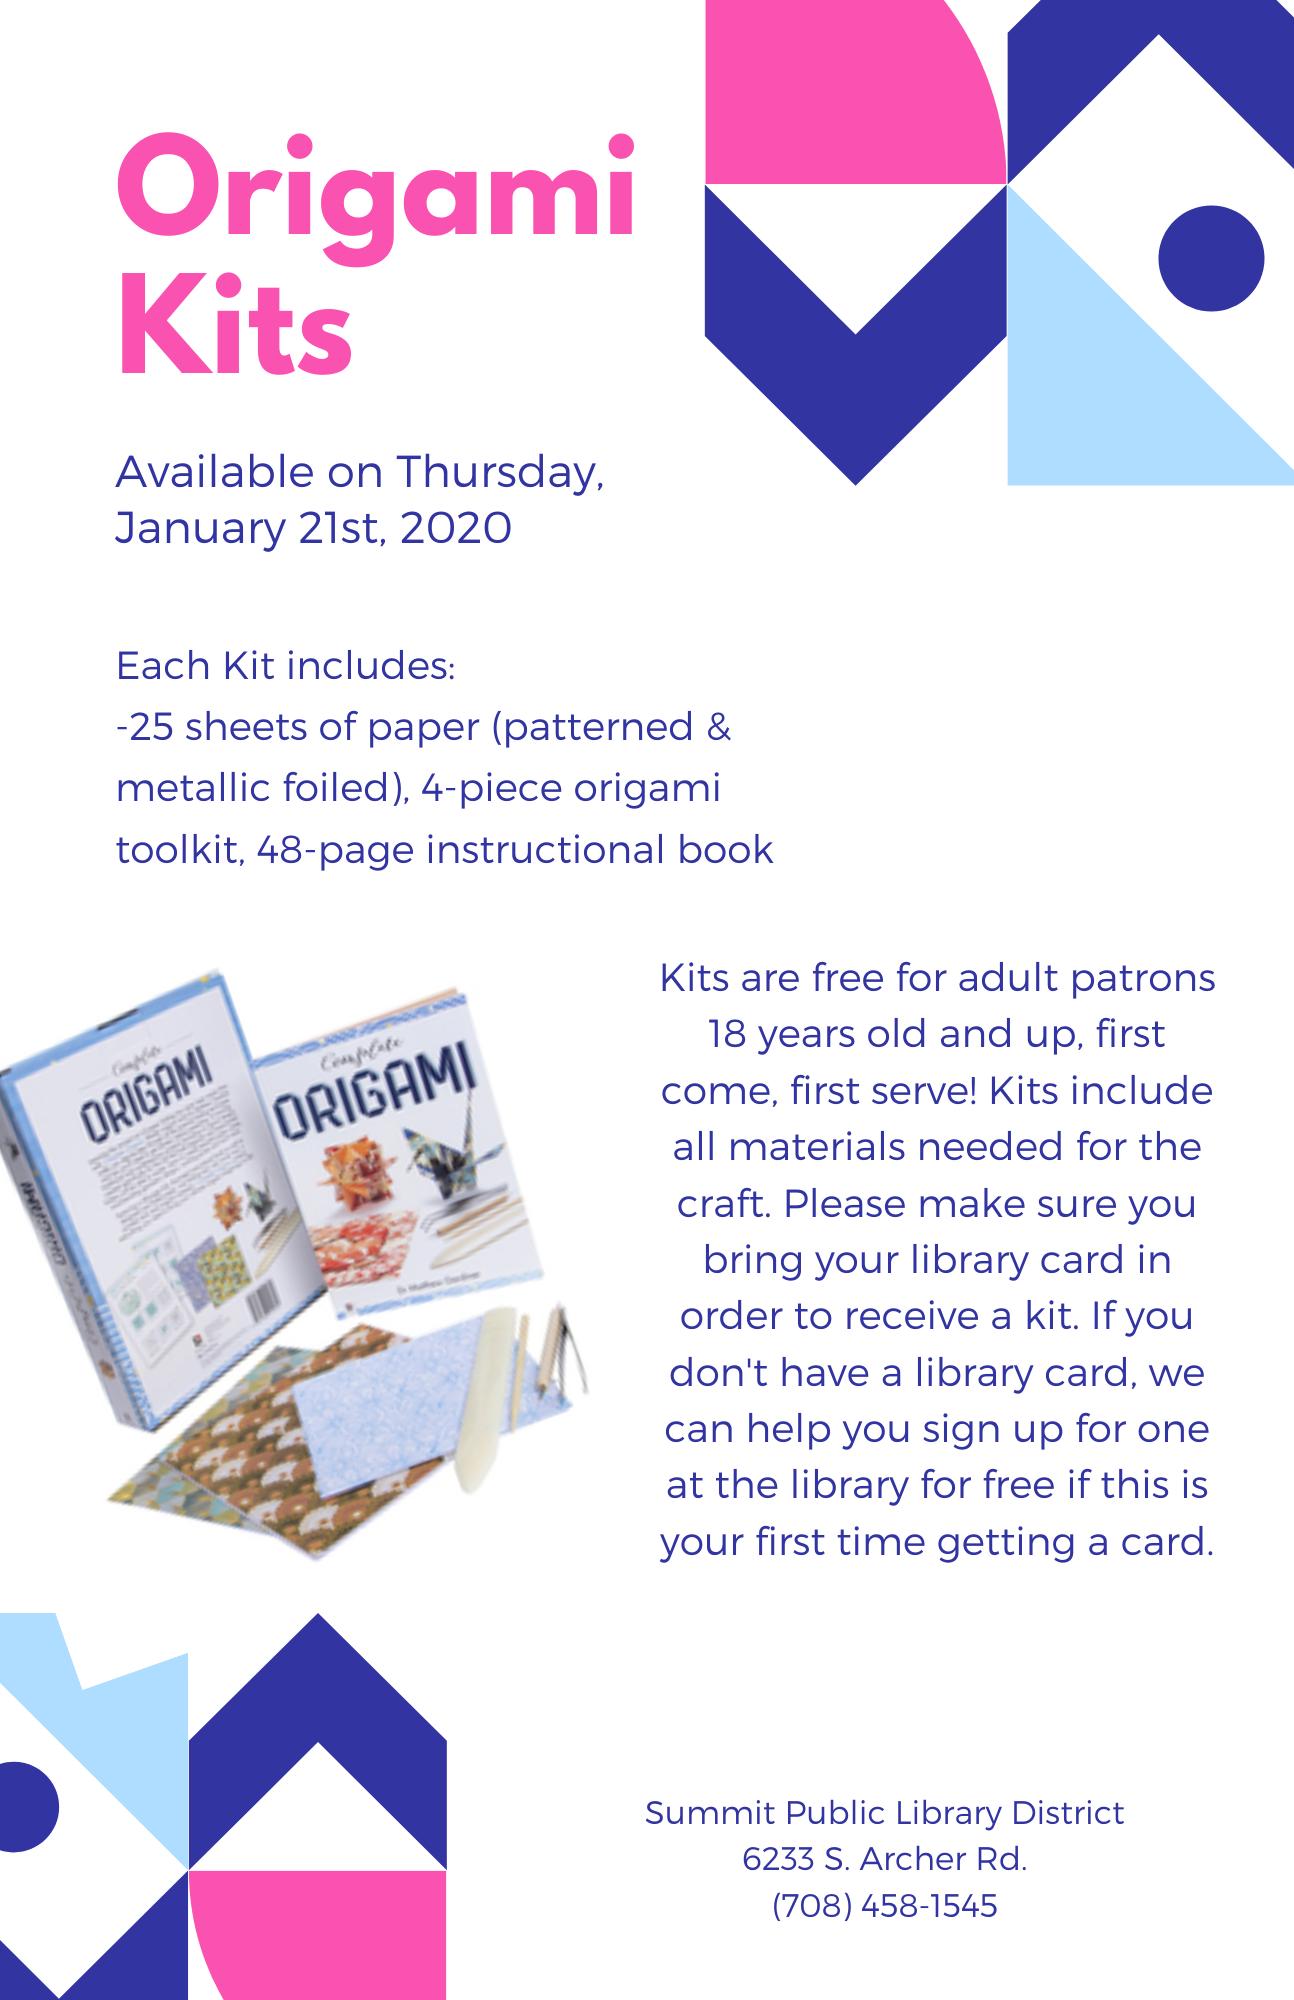 Origami Kits